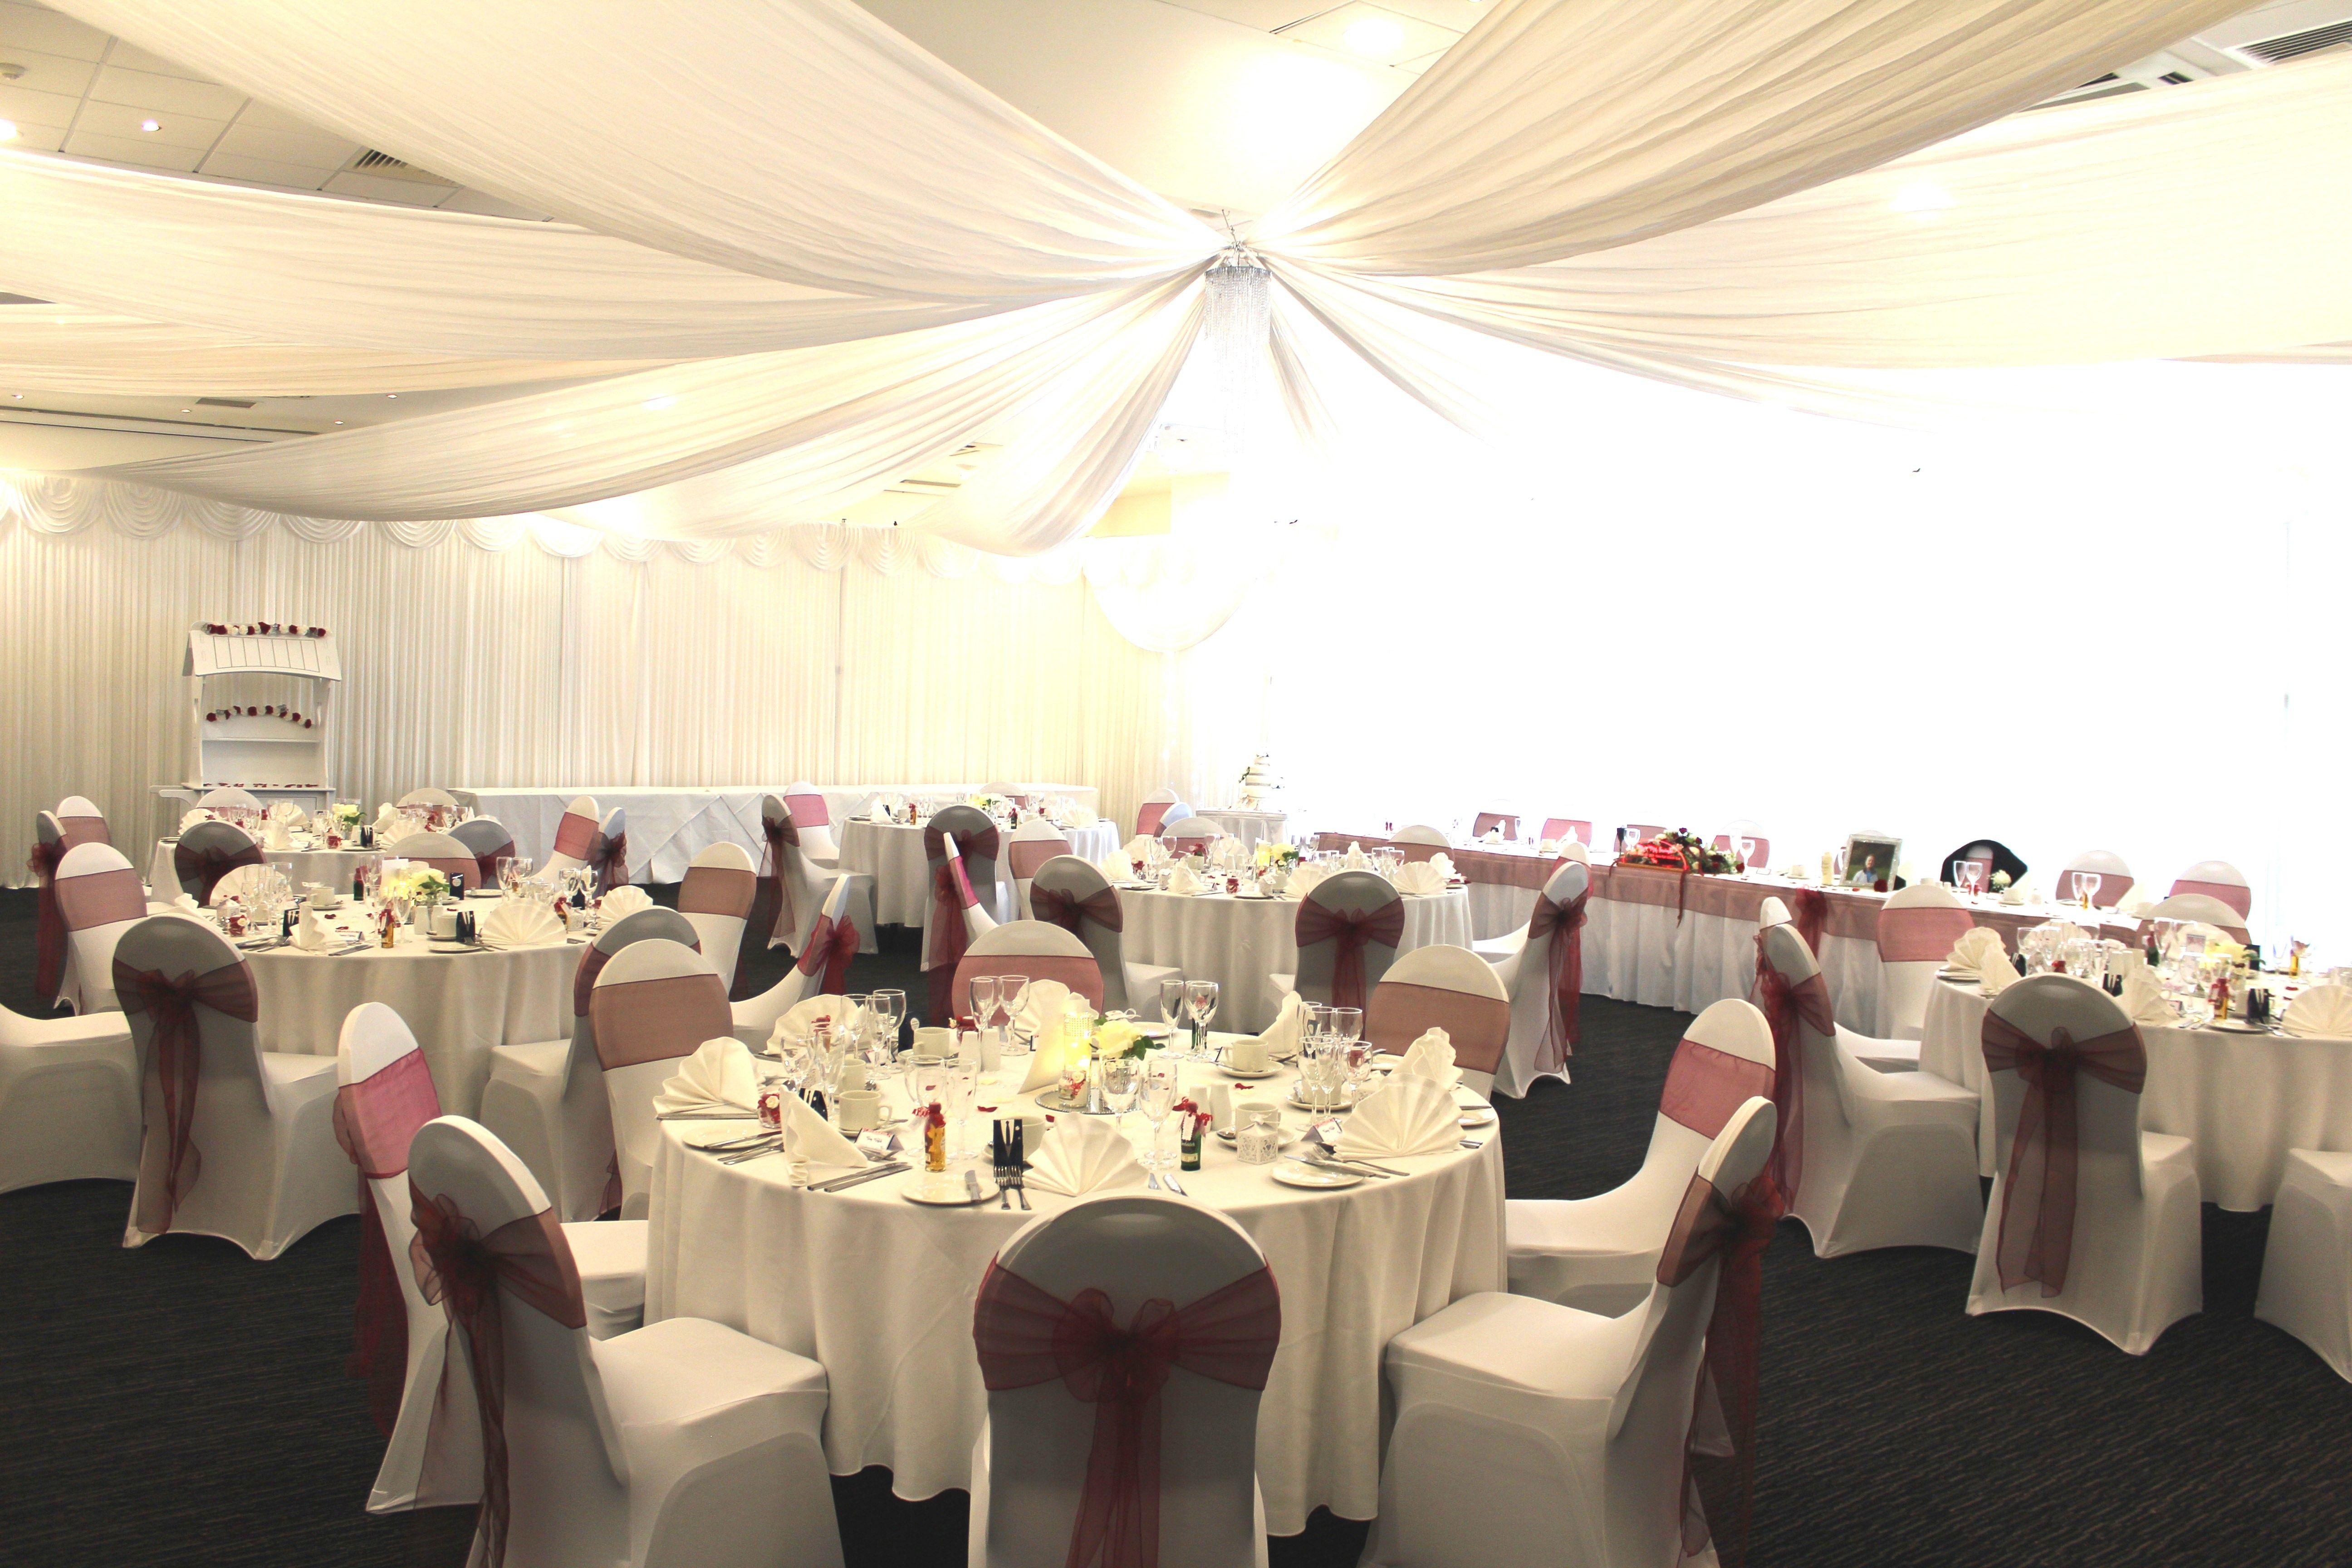 Wedding Venue Cornwall Wedding venues cornwall, Luxury